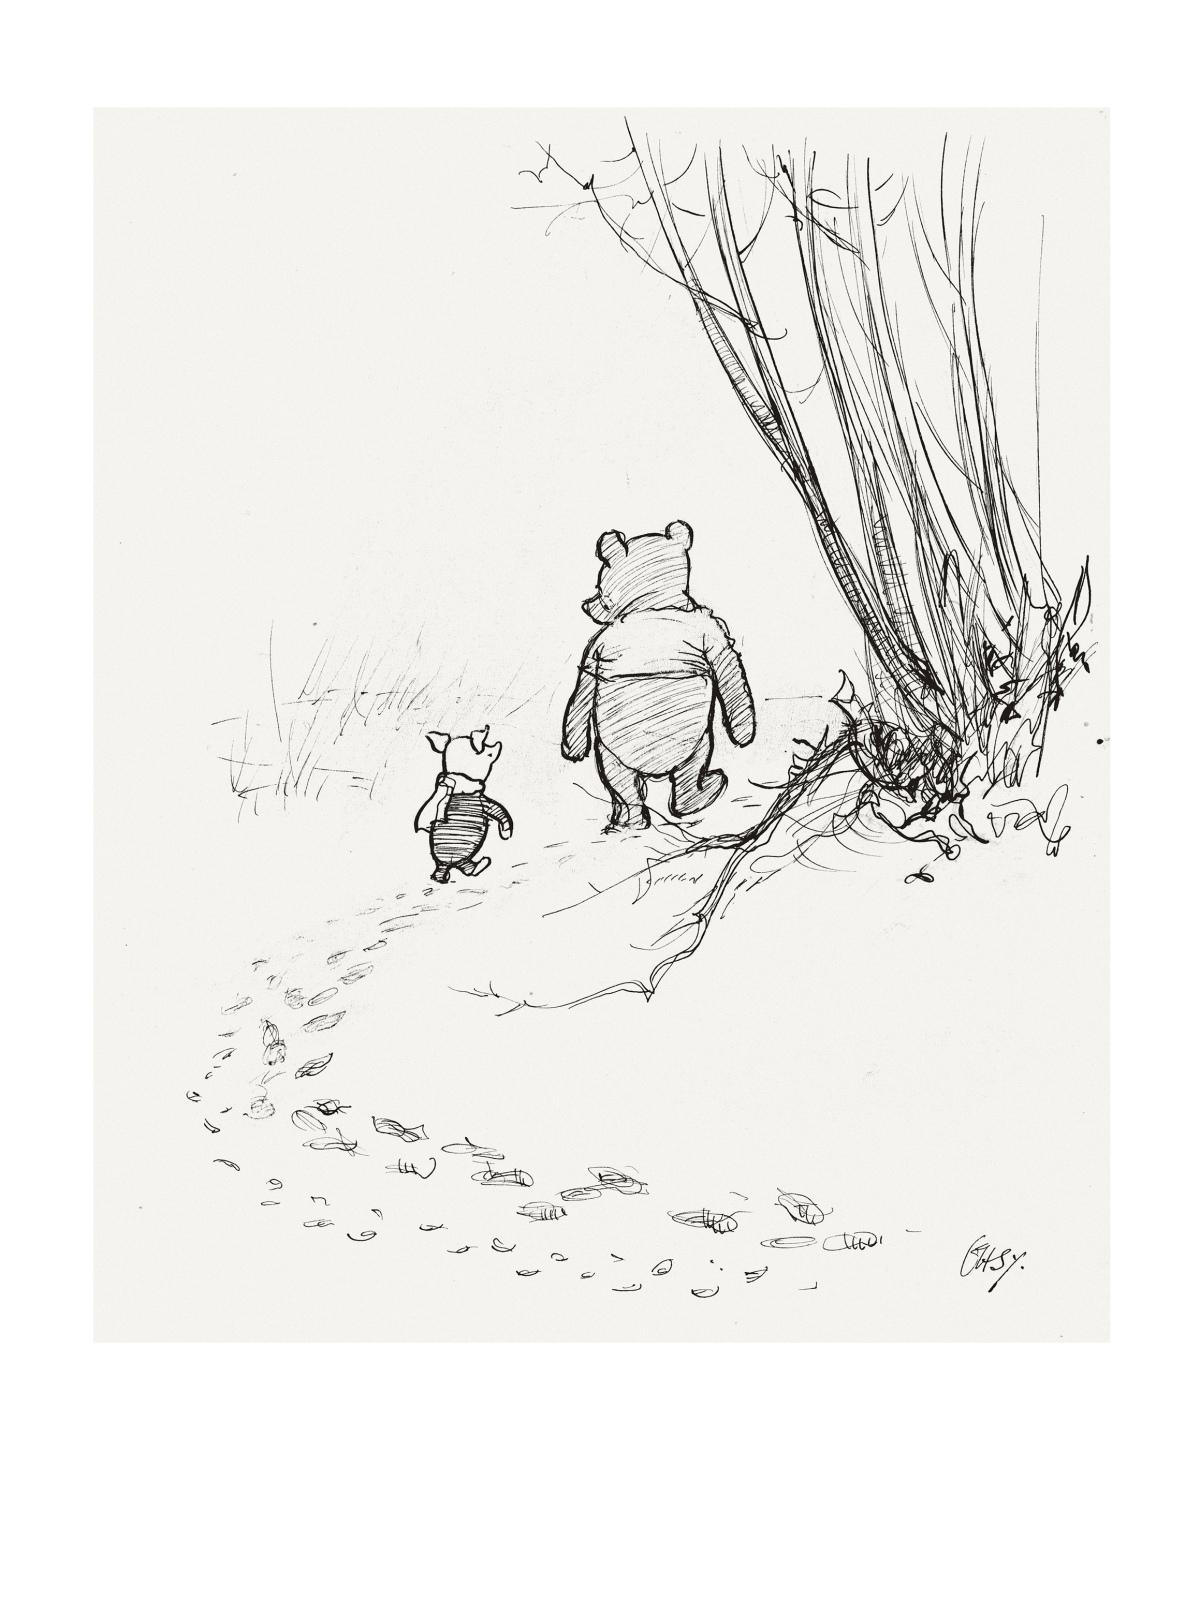 Winnie-the-Pooh Wanders into the MFABoston